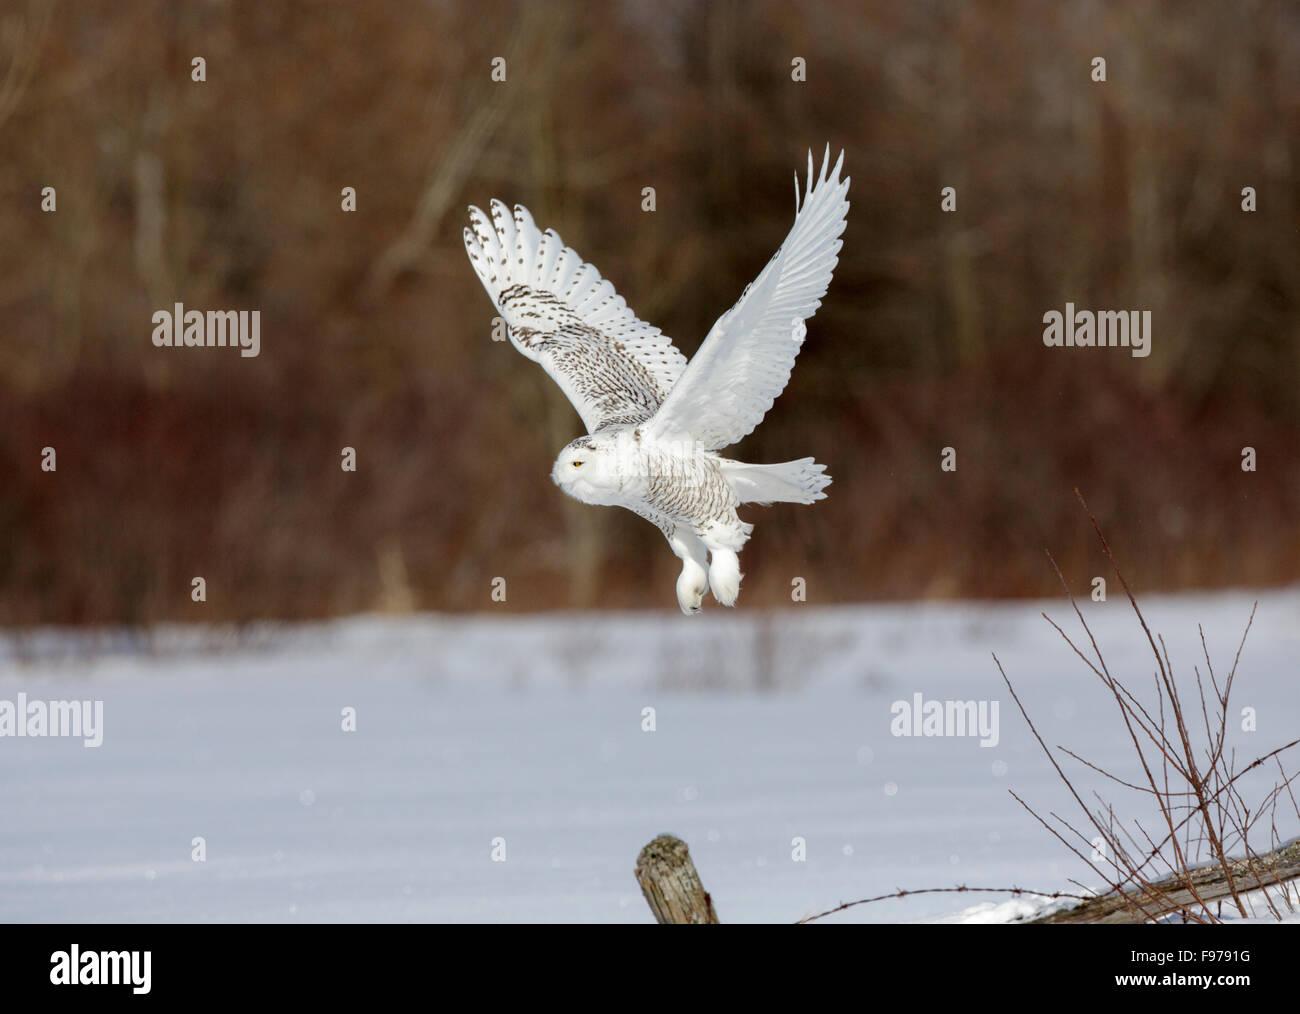 Snowy Owl, Bubo scandiacus, Ontario, Canada, February 2013 Stock Photo